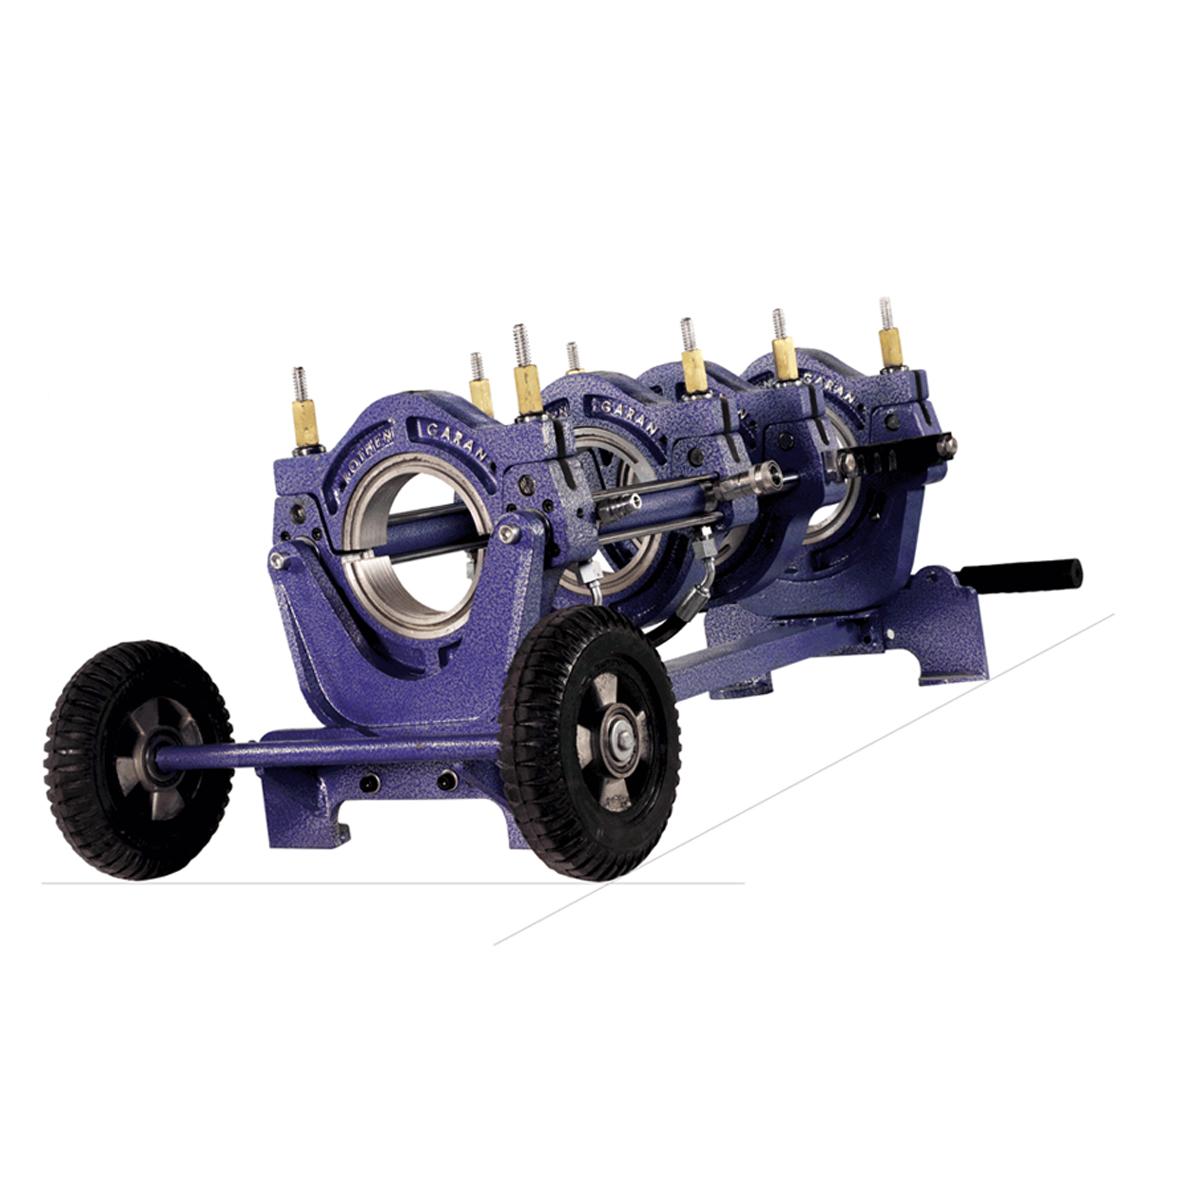 دستگاه جوش پلی اتیلن تمام هیدرولیک 160